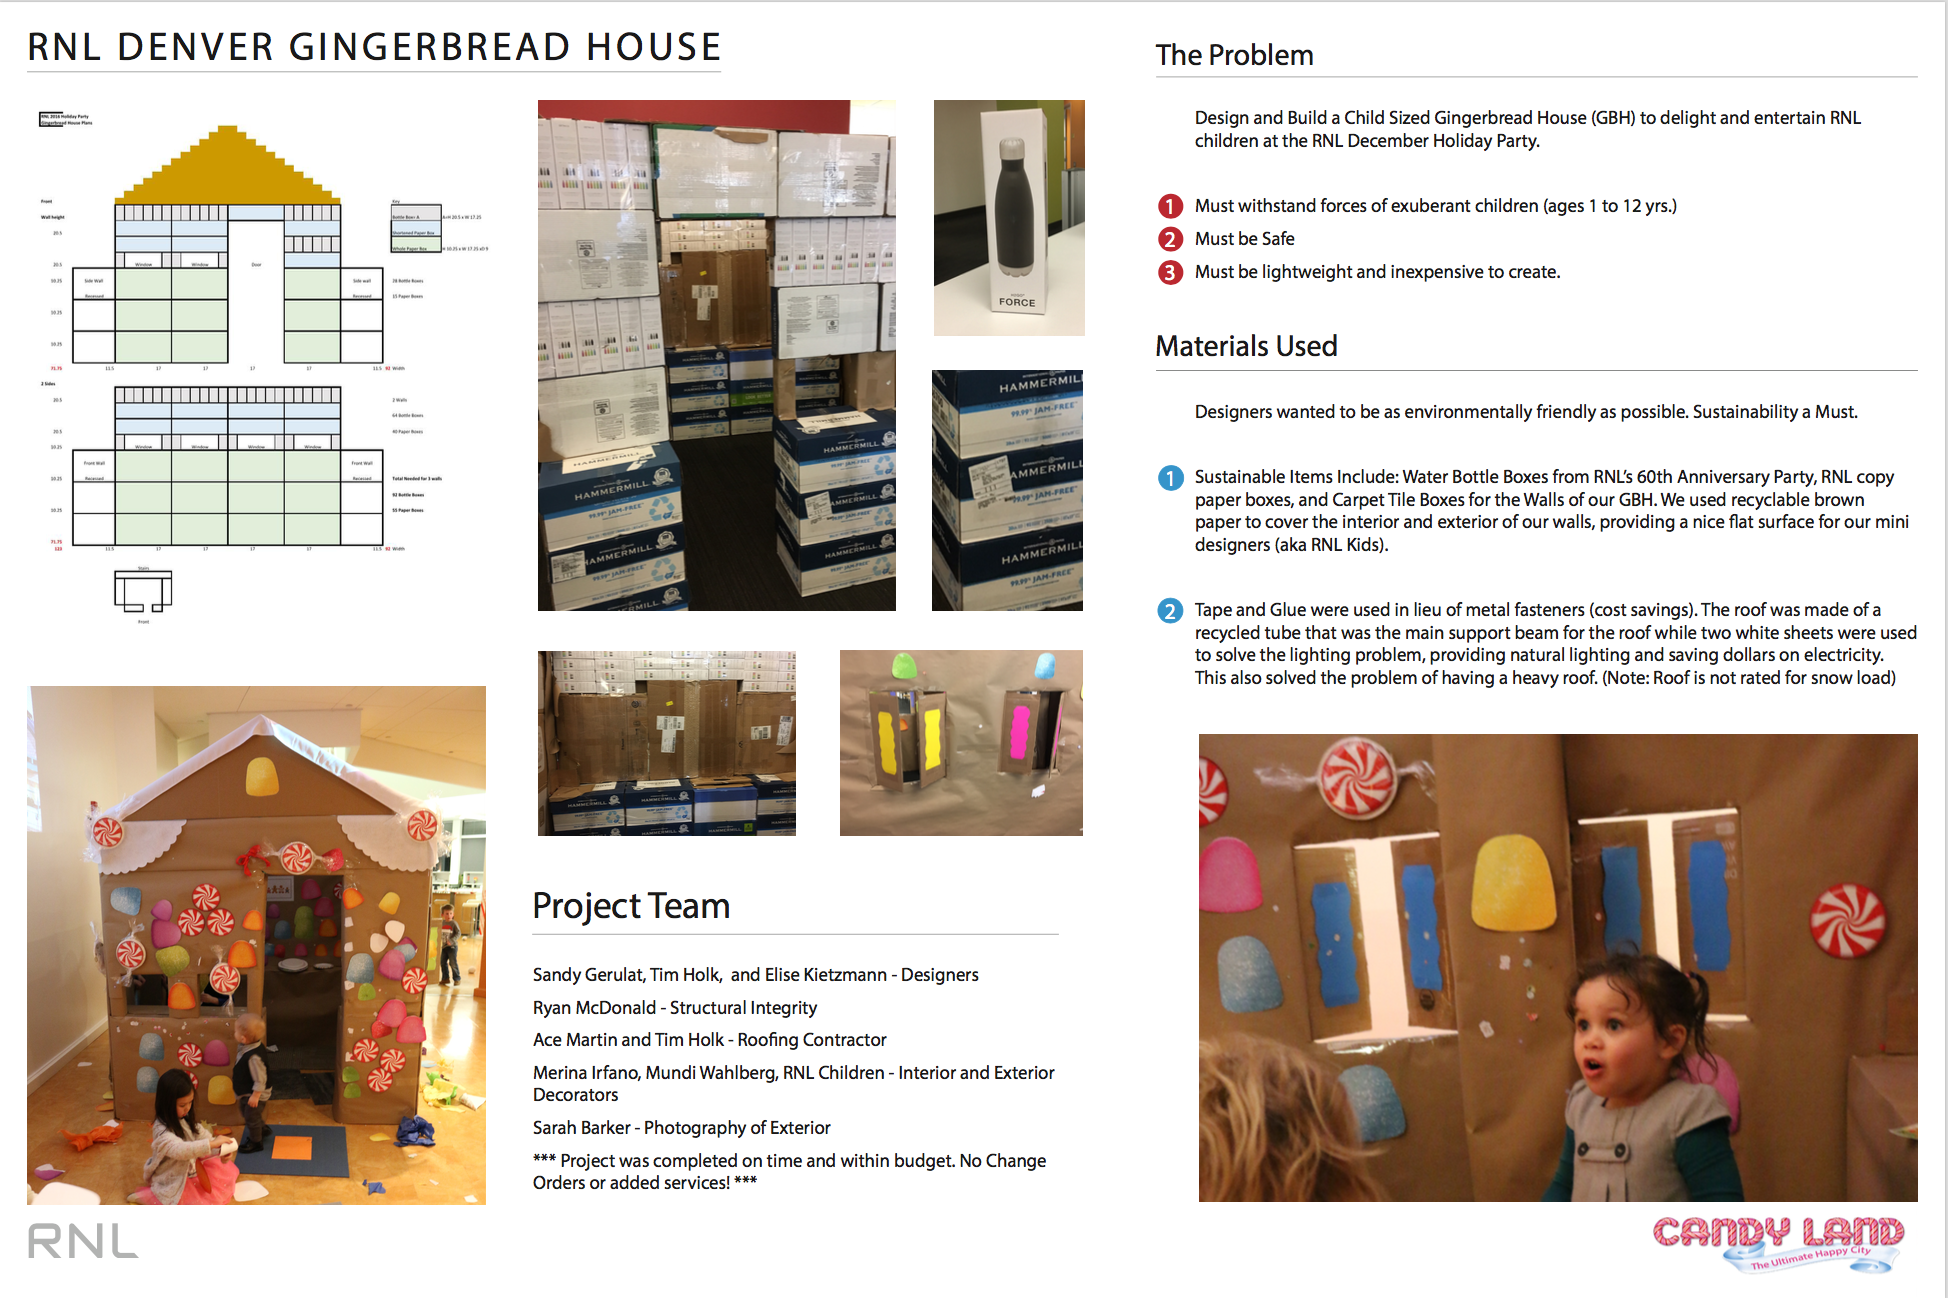 RNL Gingerbread House